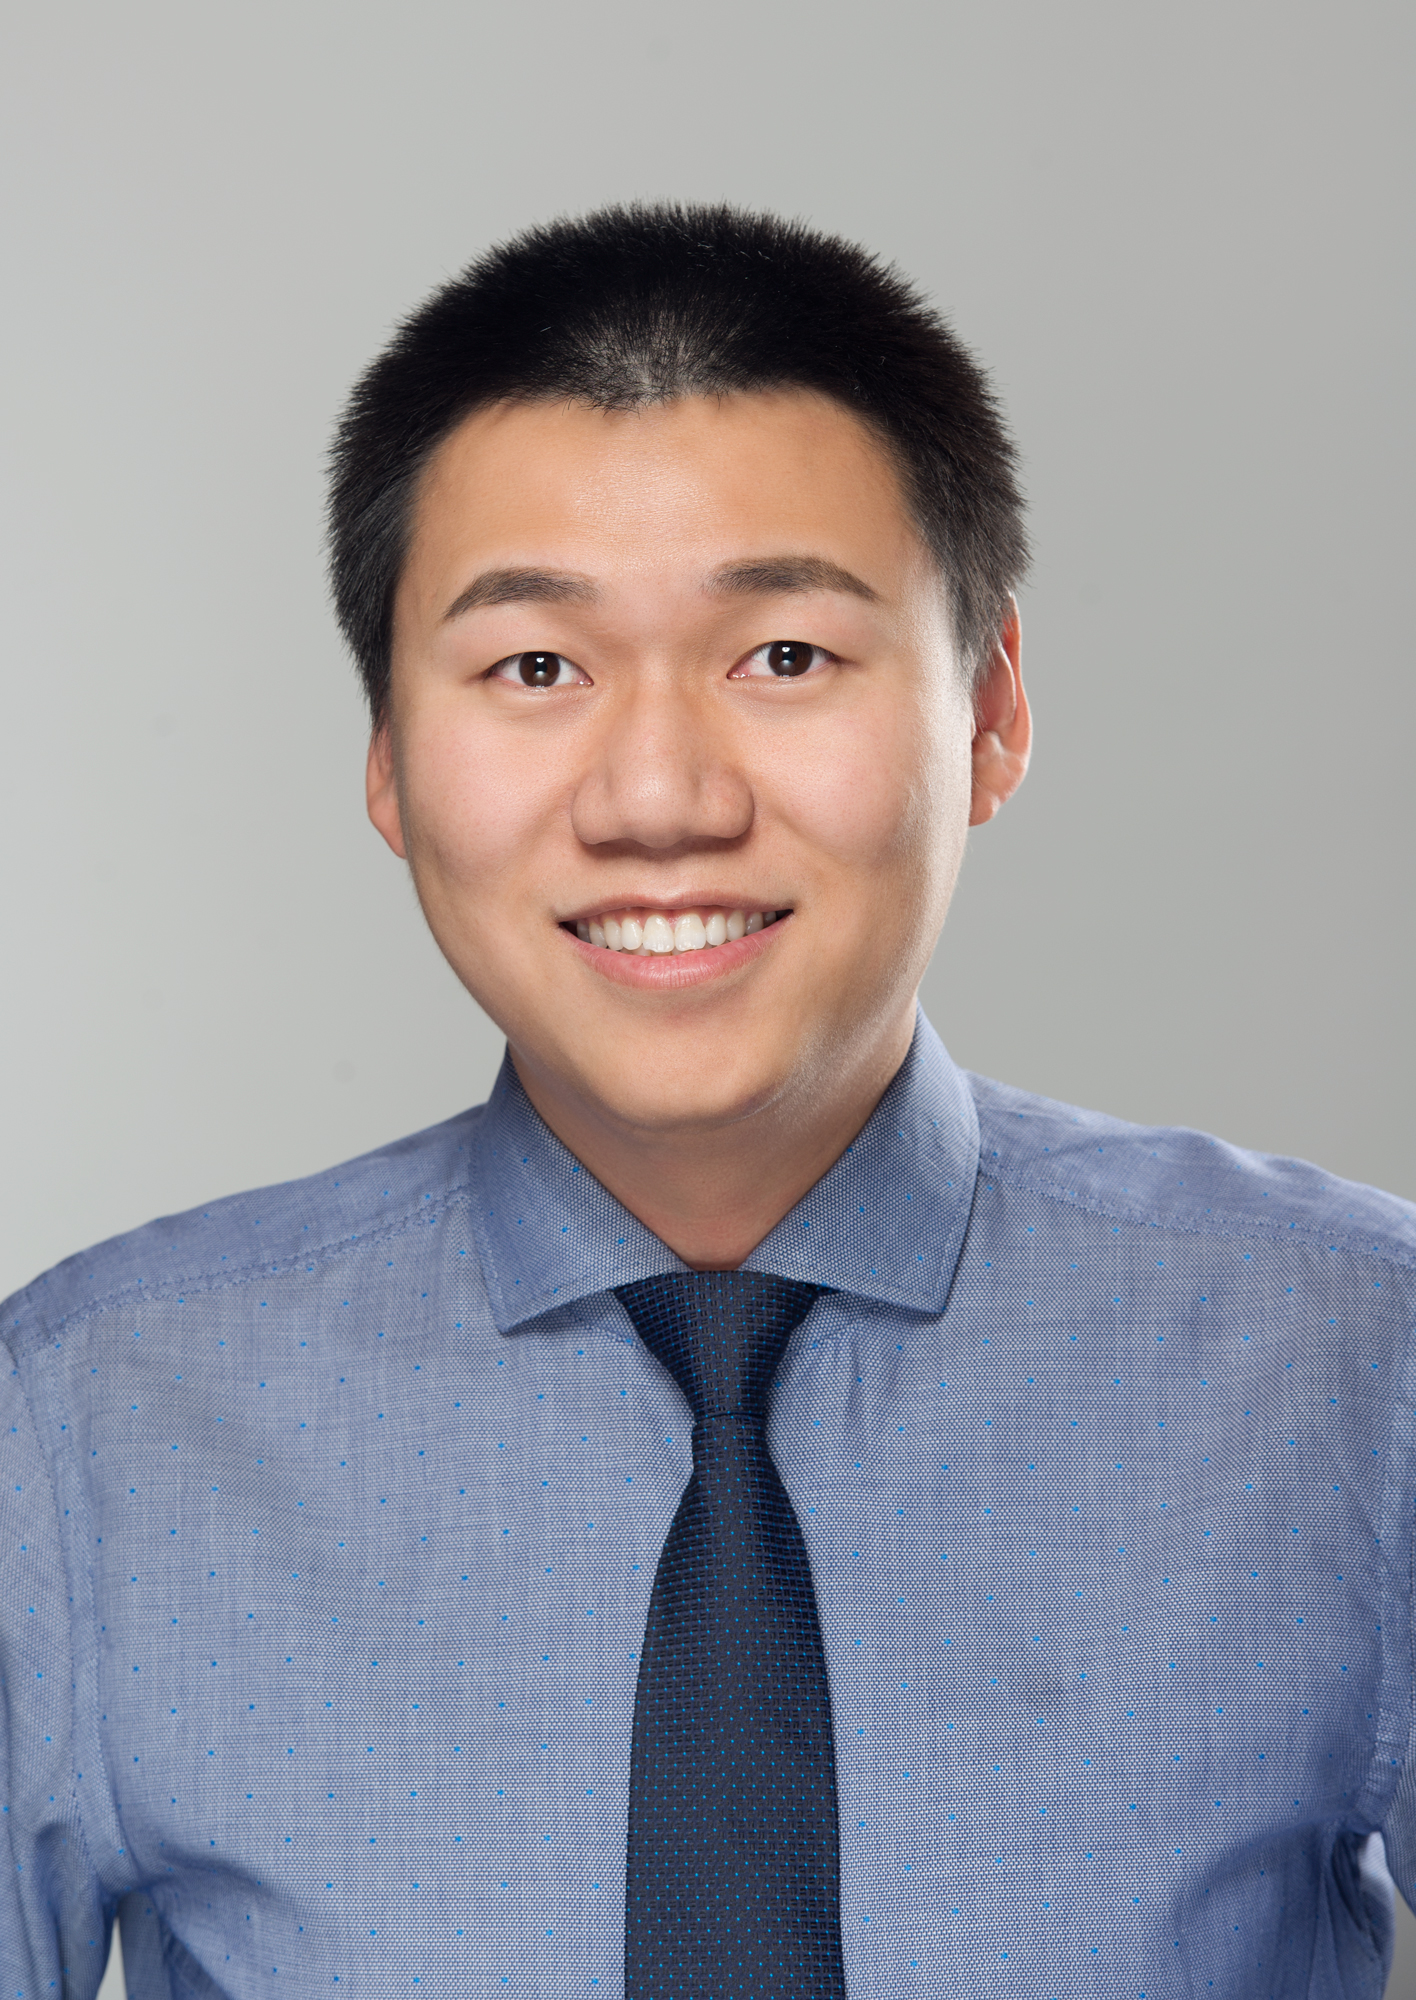 Ke - Professional Portrait - Realtor, August 2017